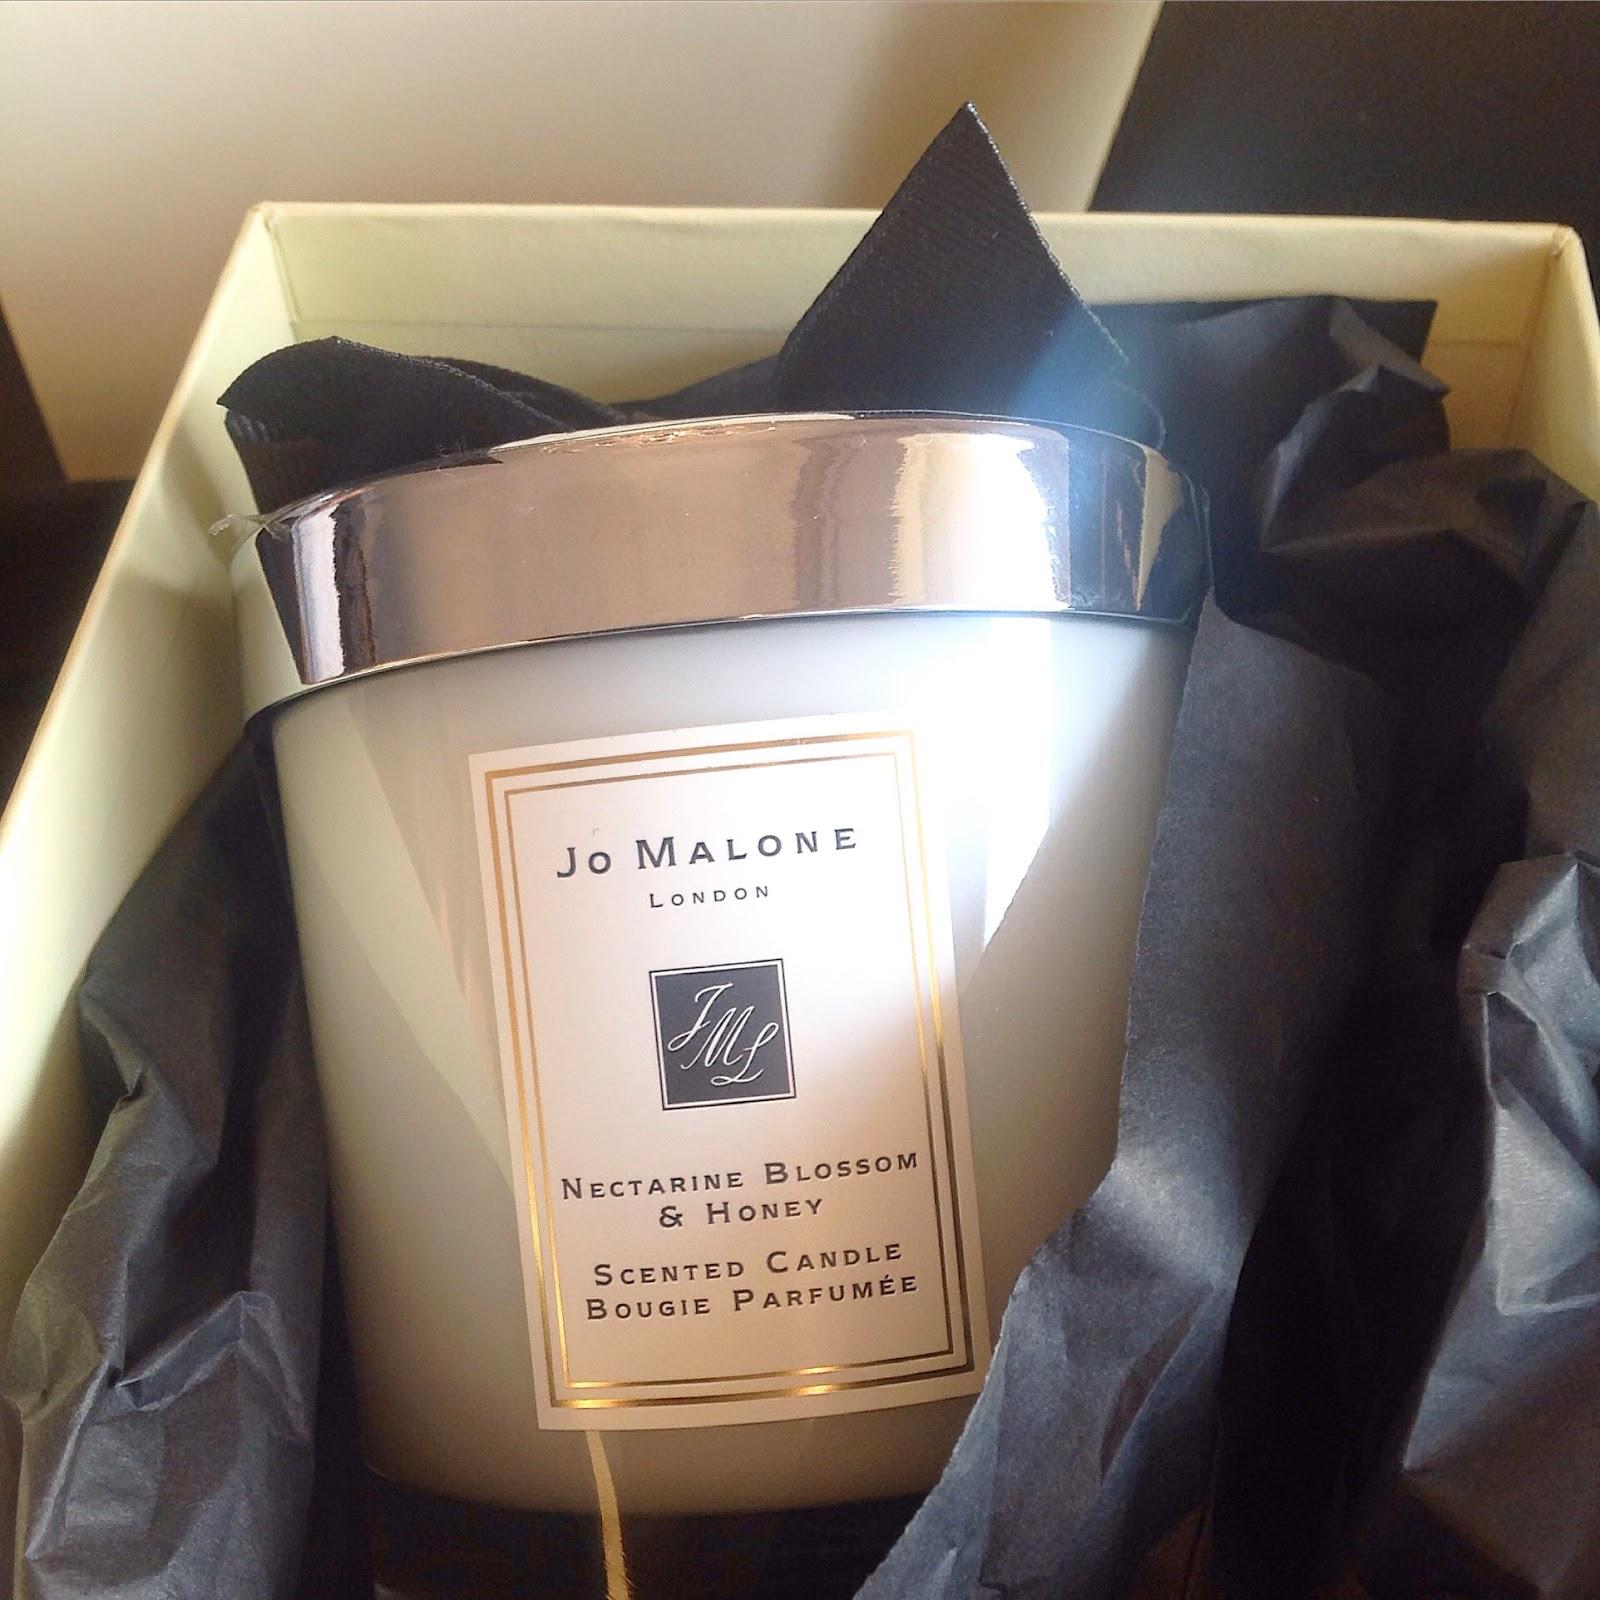 Nectarine Blossom and Honey Jo Malone Candle